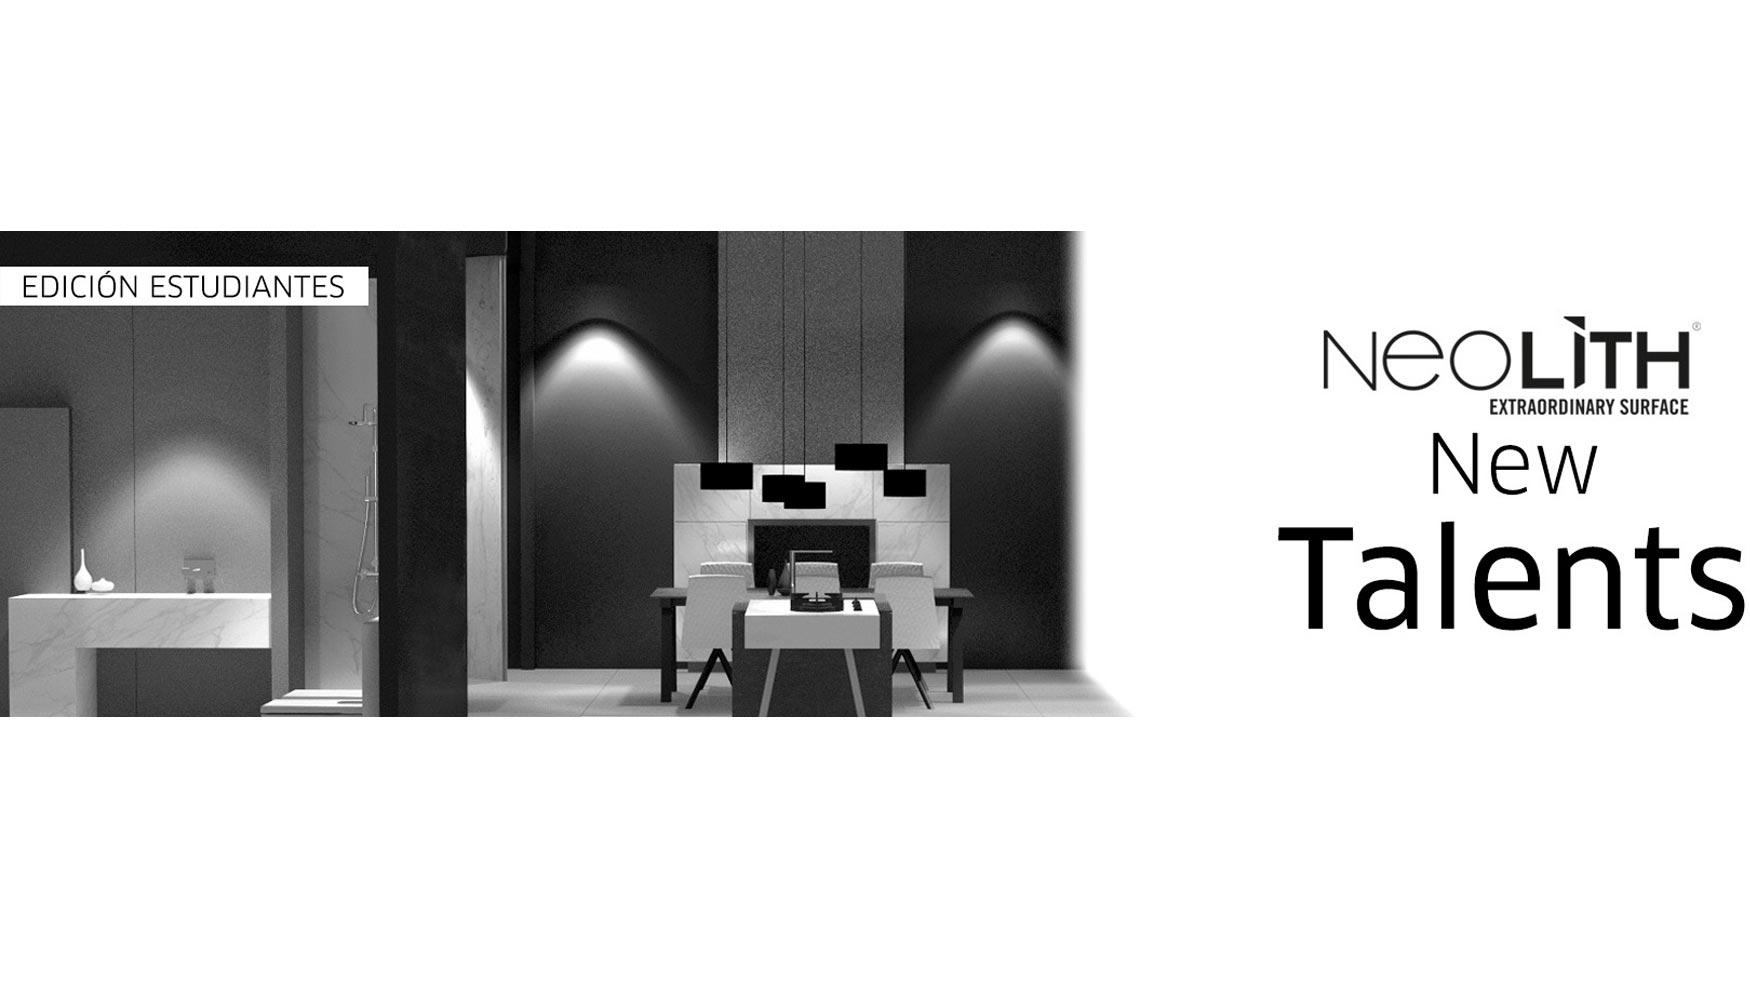 Concurso 'Neolith New Talents', de TheSize.